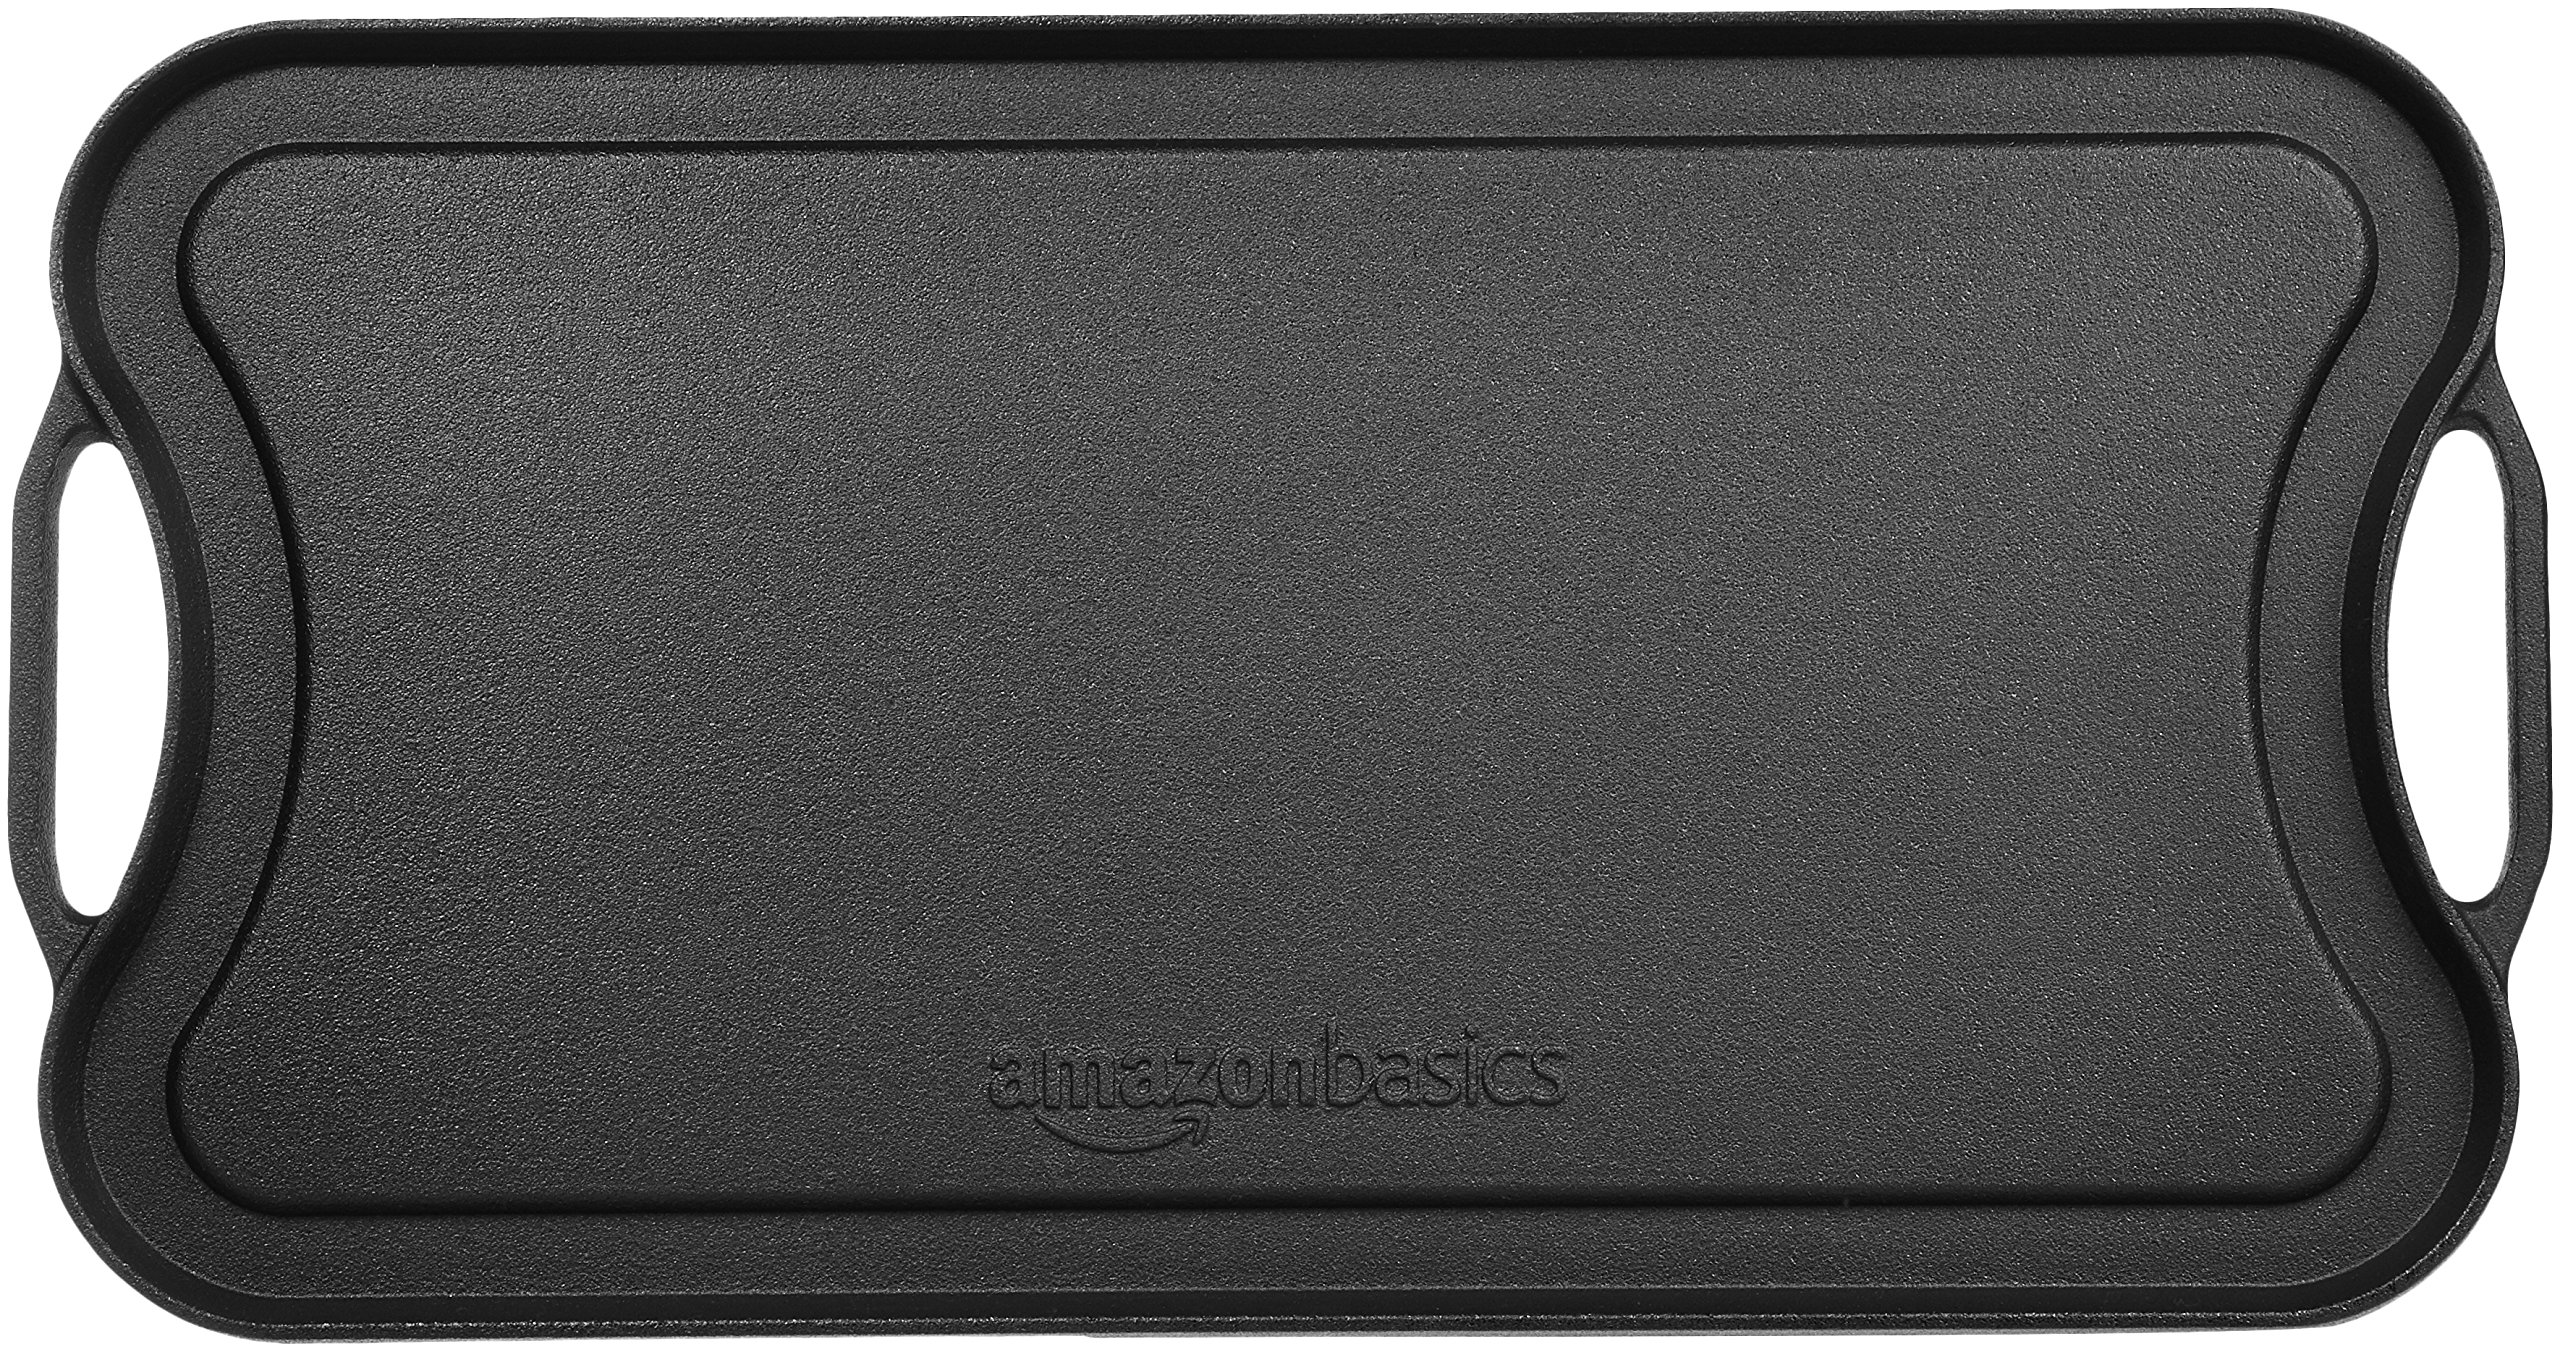 AmazonBasics Pre-Seasoned Cast Iron Reversible Grill/Griddle -(5204) by AmazonBasics (Image #6)